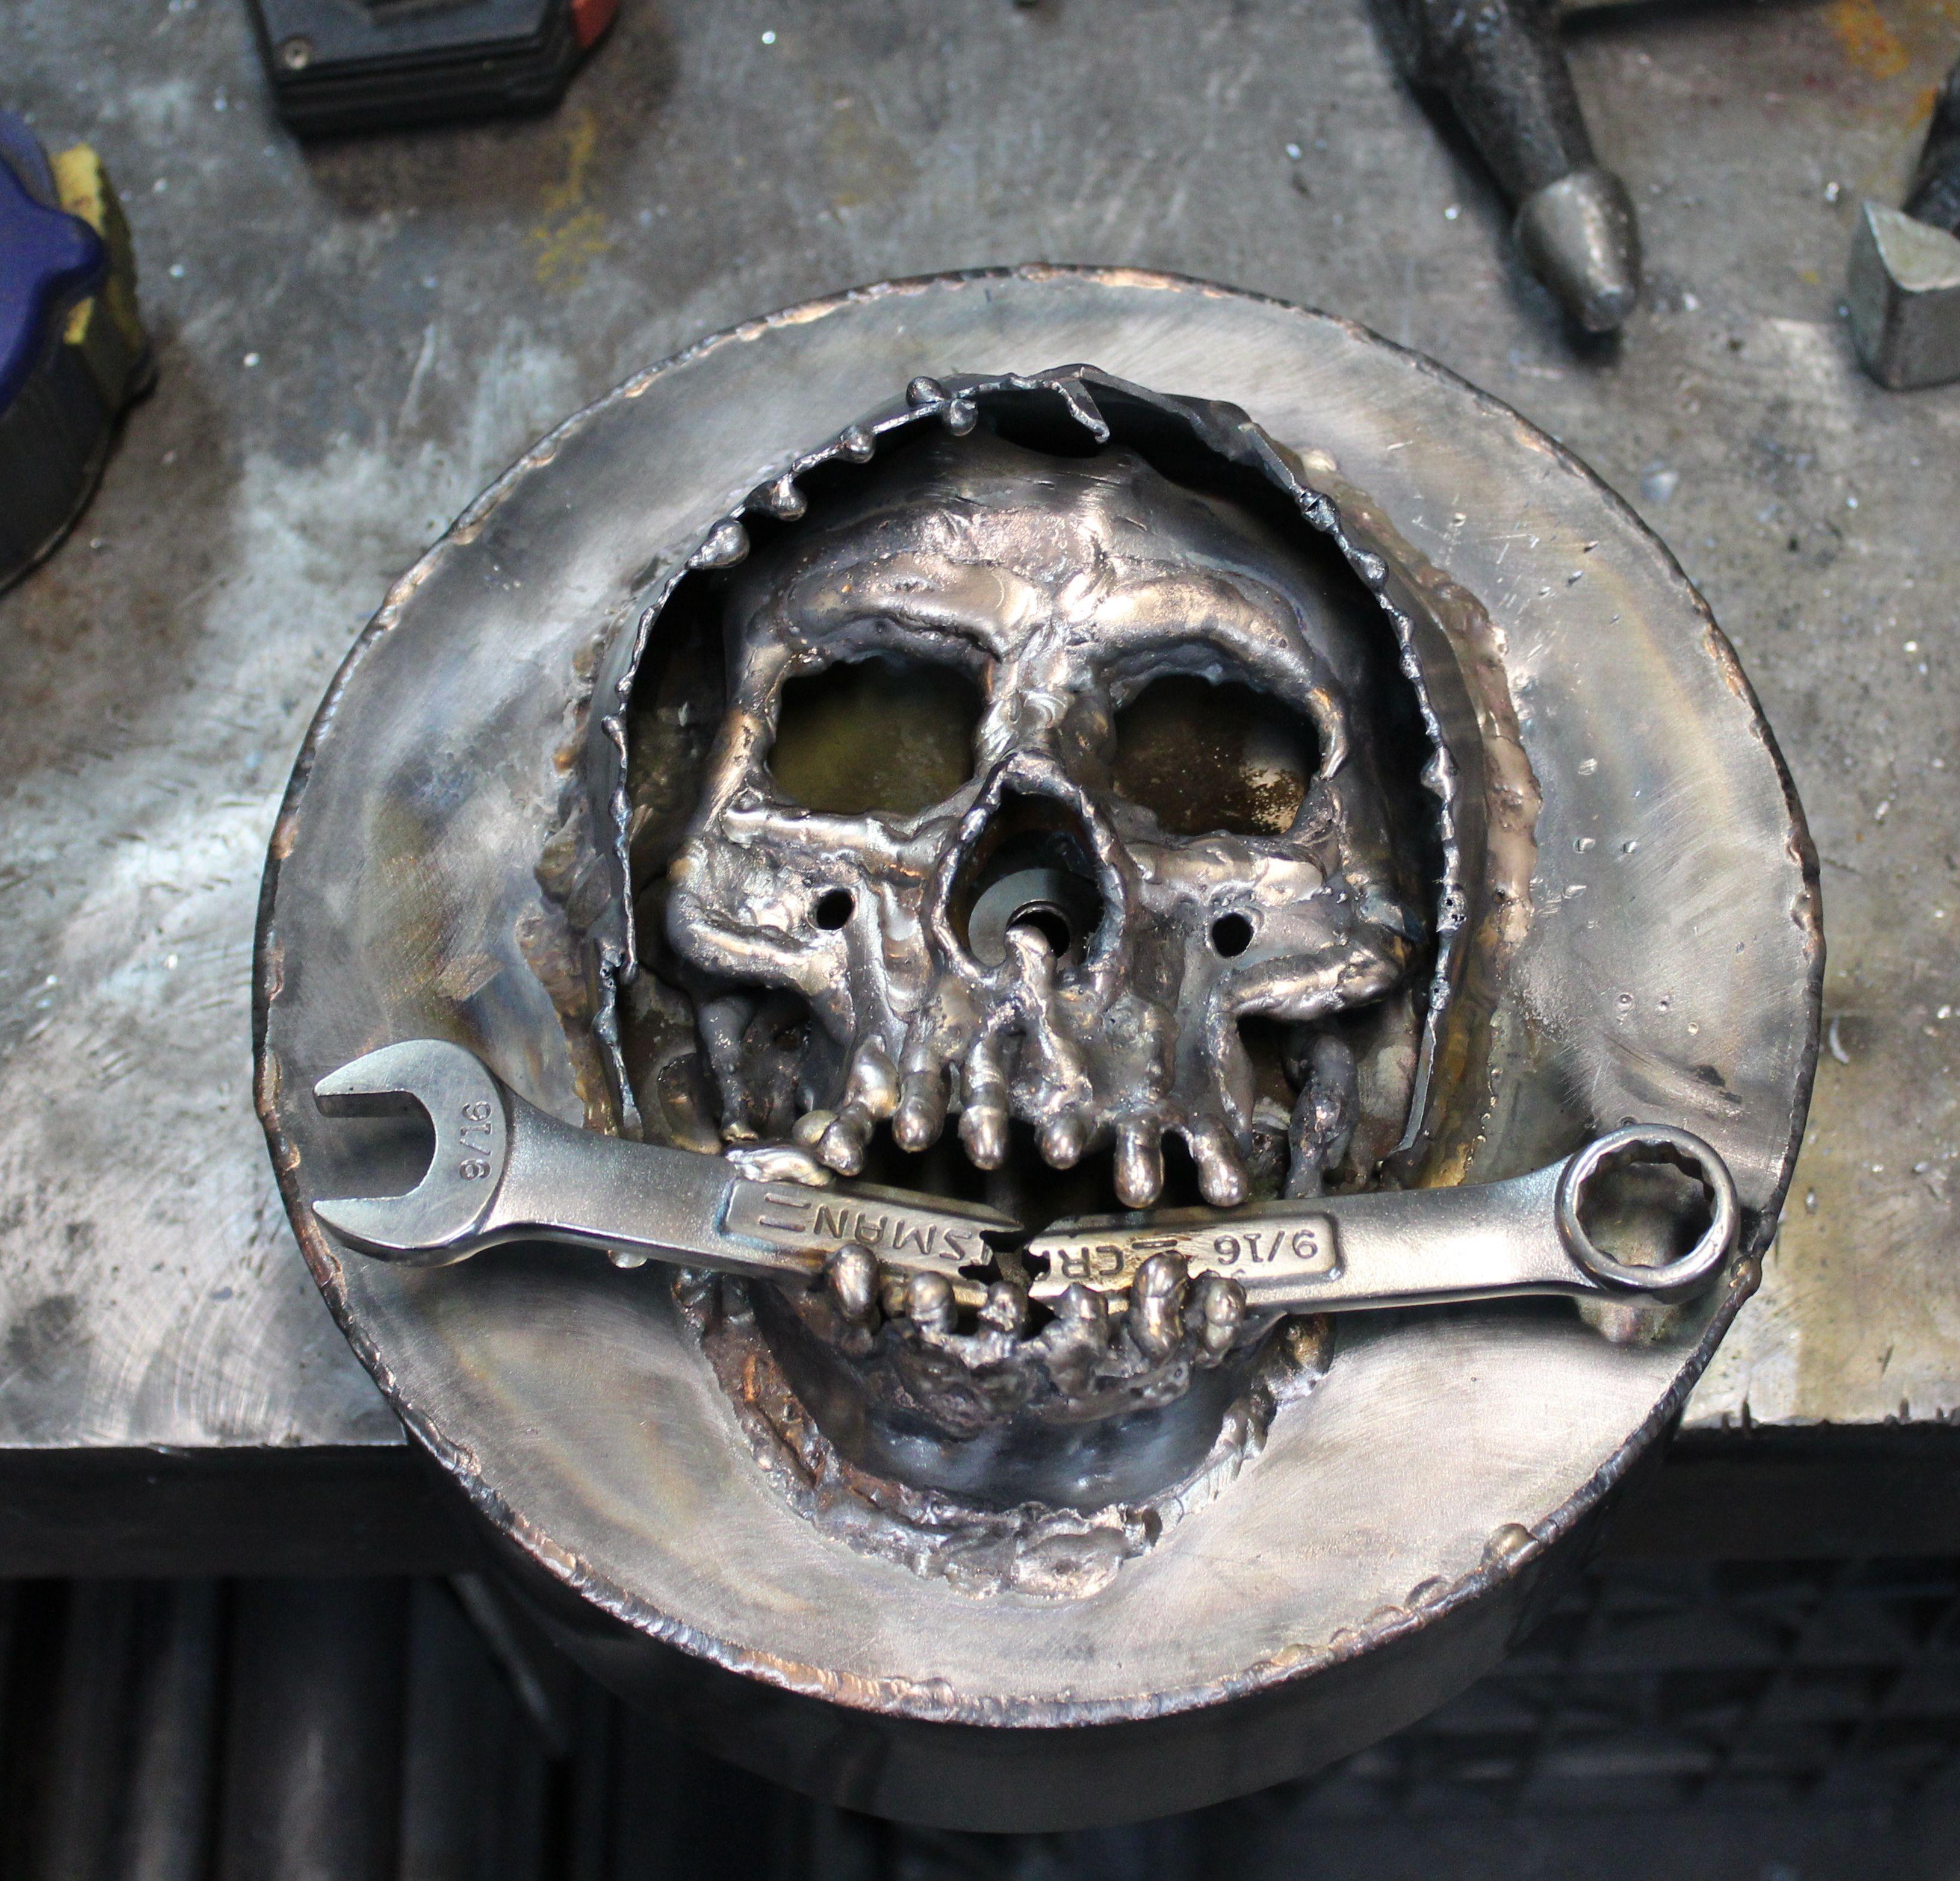 custom hand made tig welded metal skull Harley mikuni air